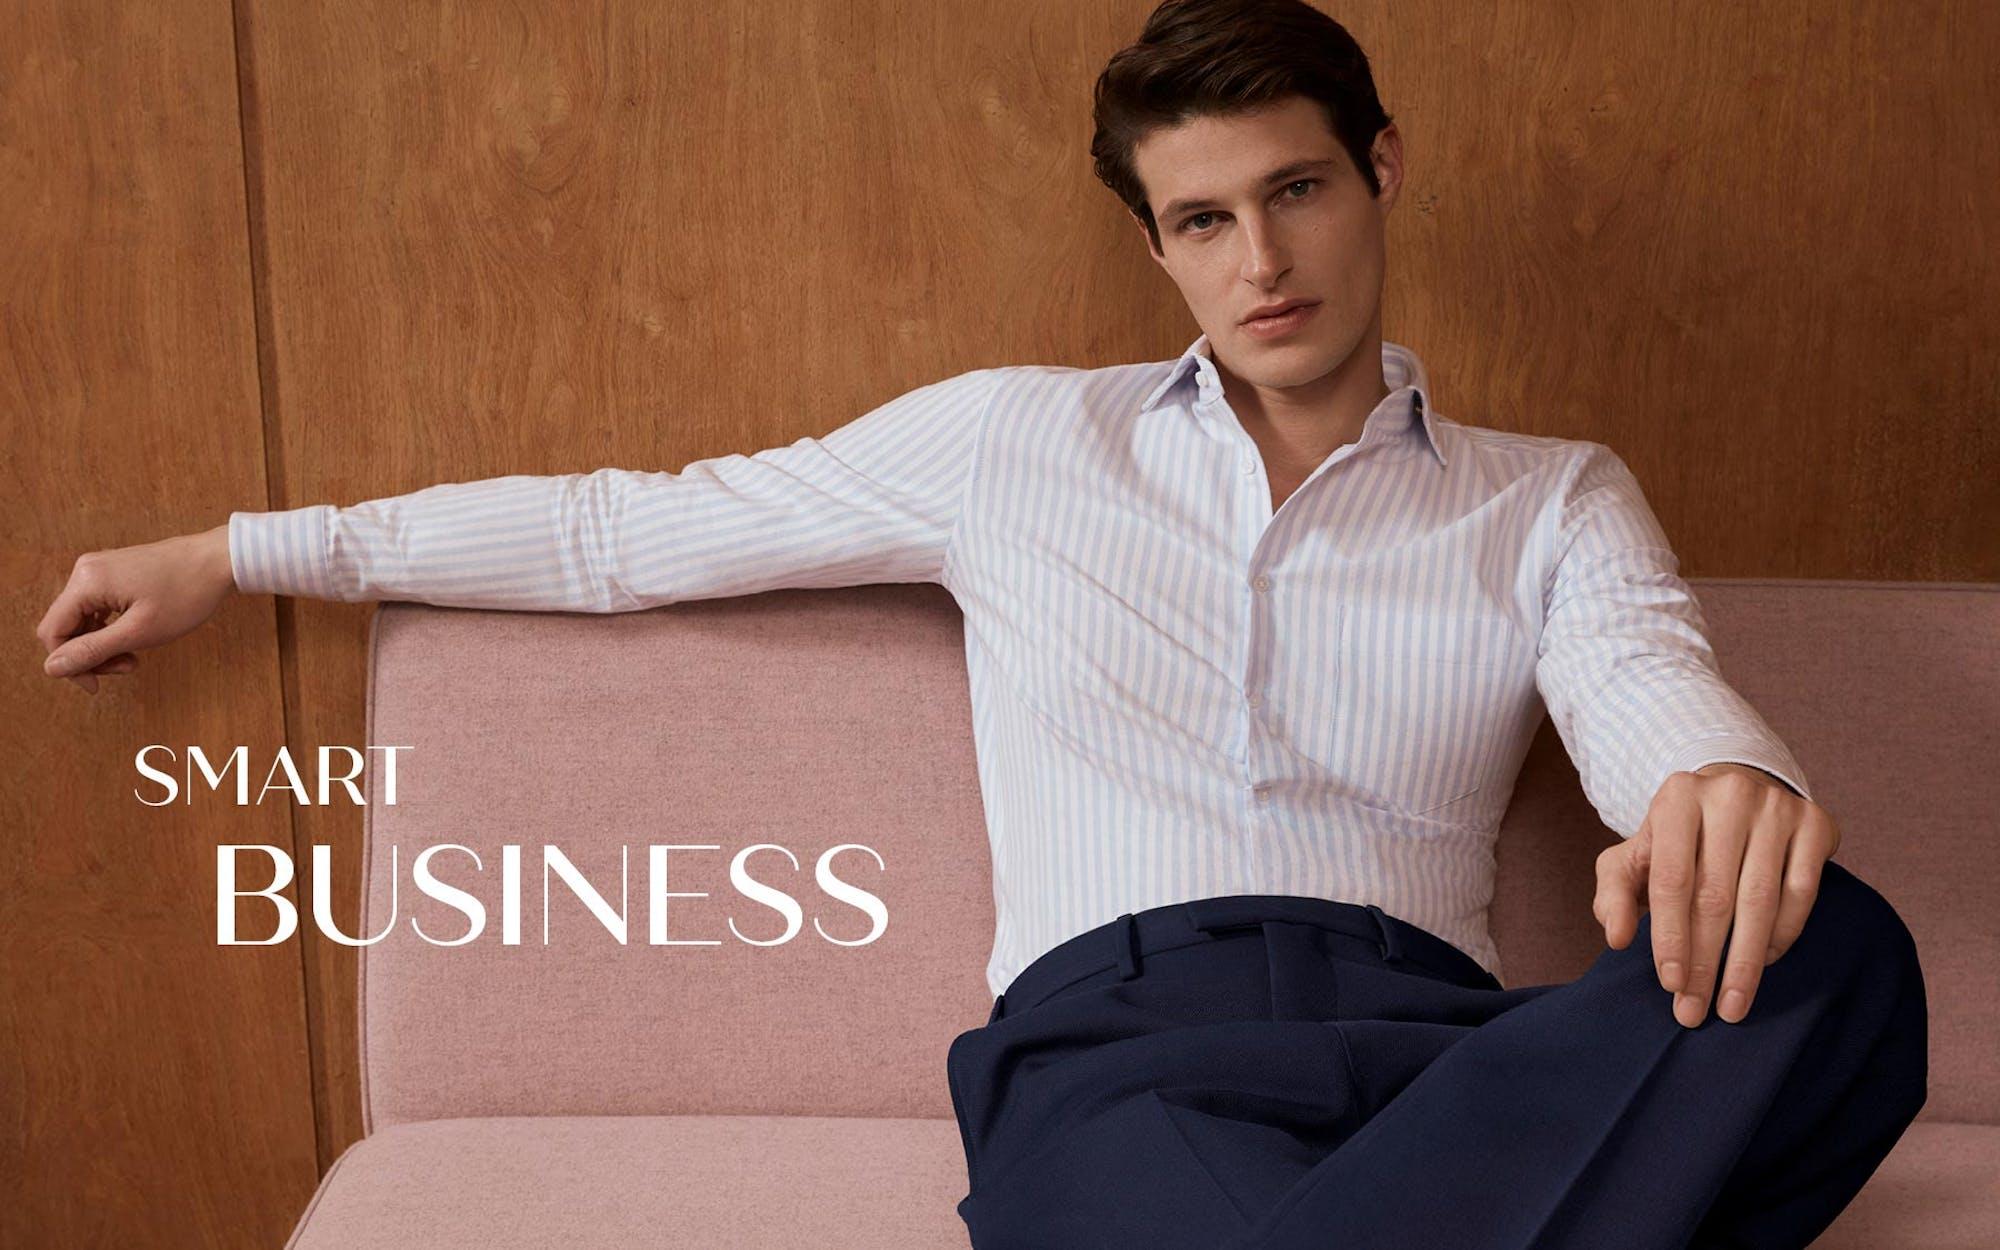 Smart Business Herren | Seidensticker